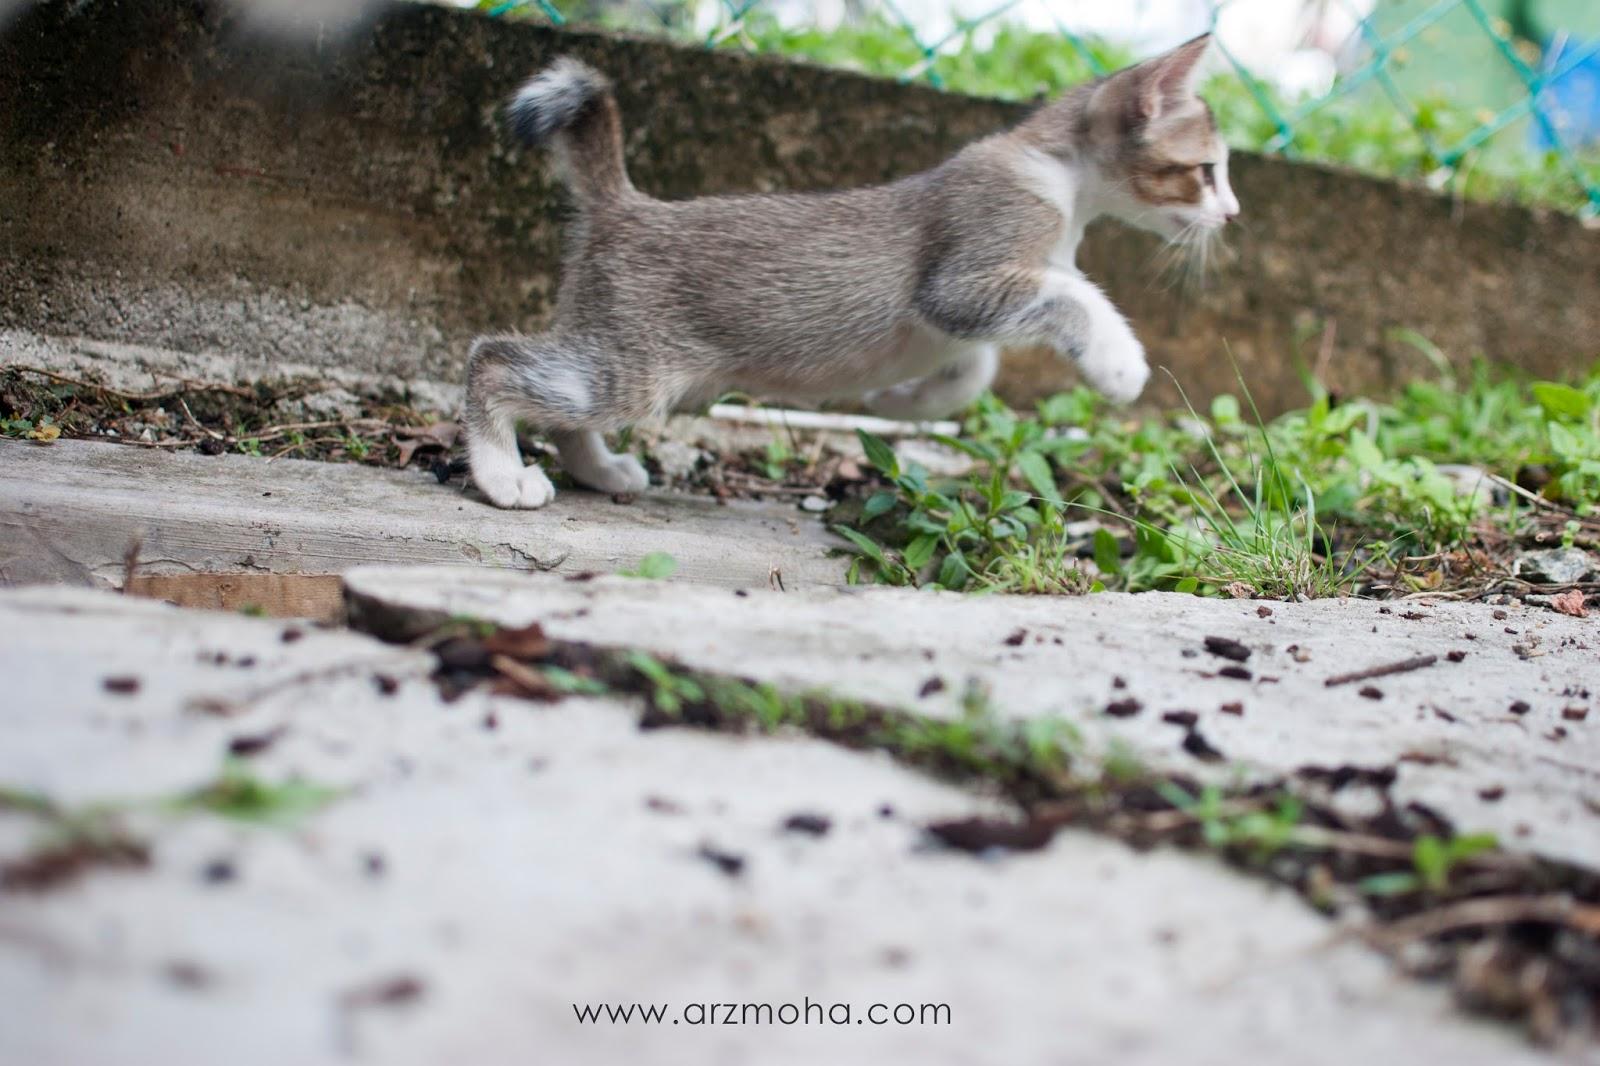 95 Gambar Gambar Kucing Hilang Terlihat Keren